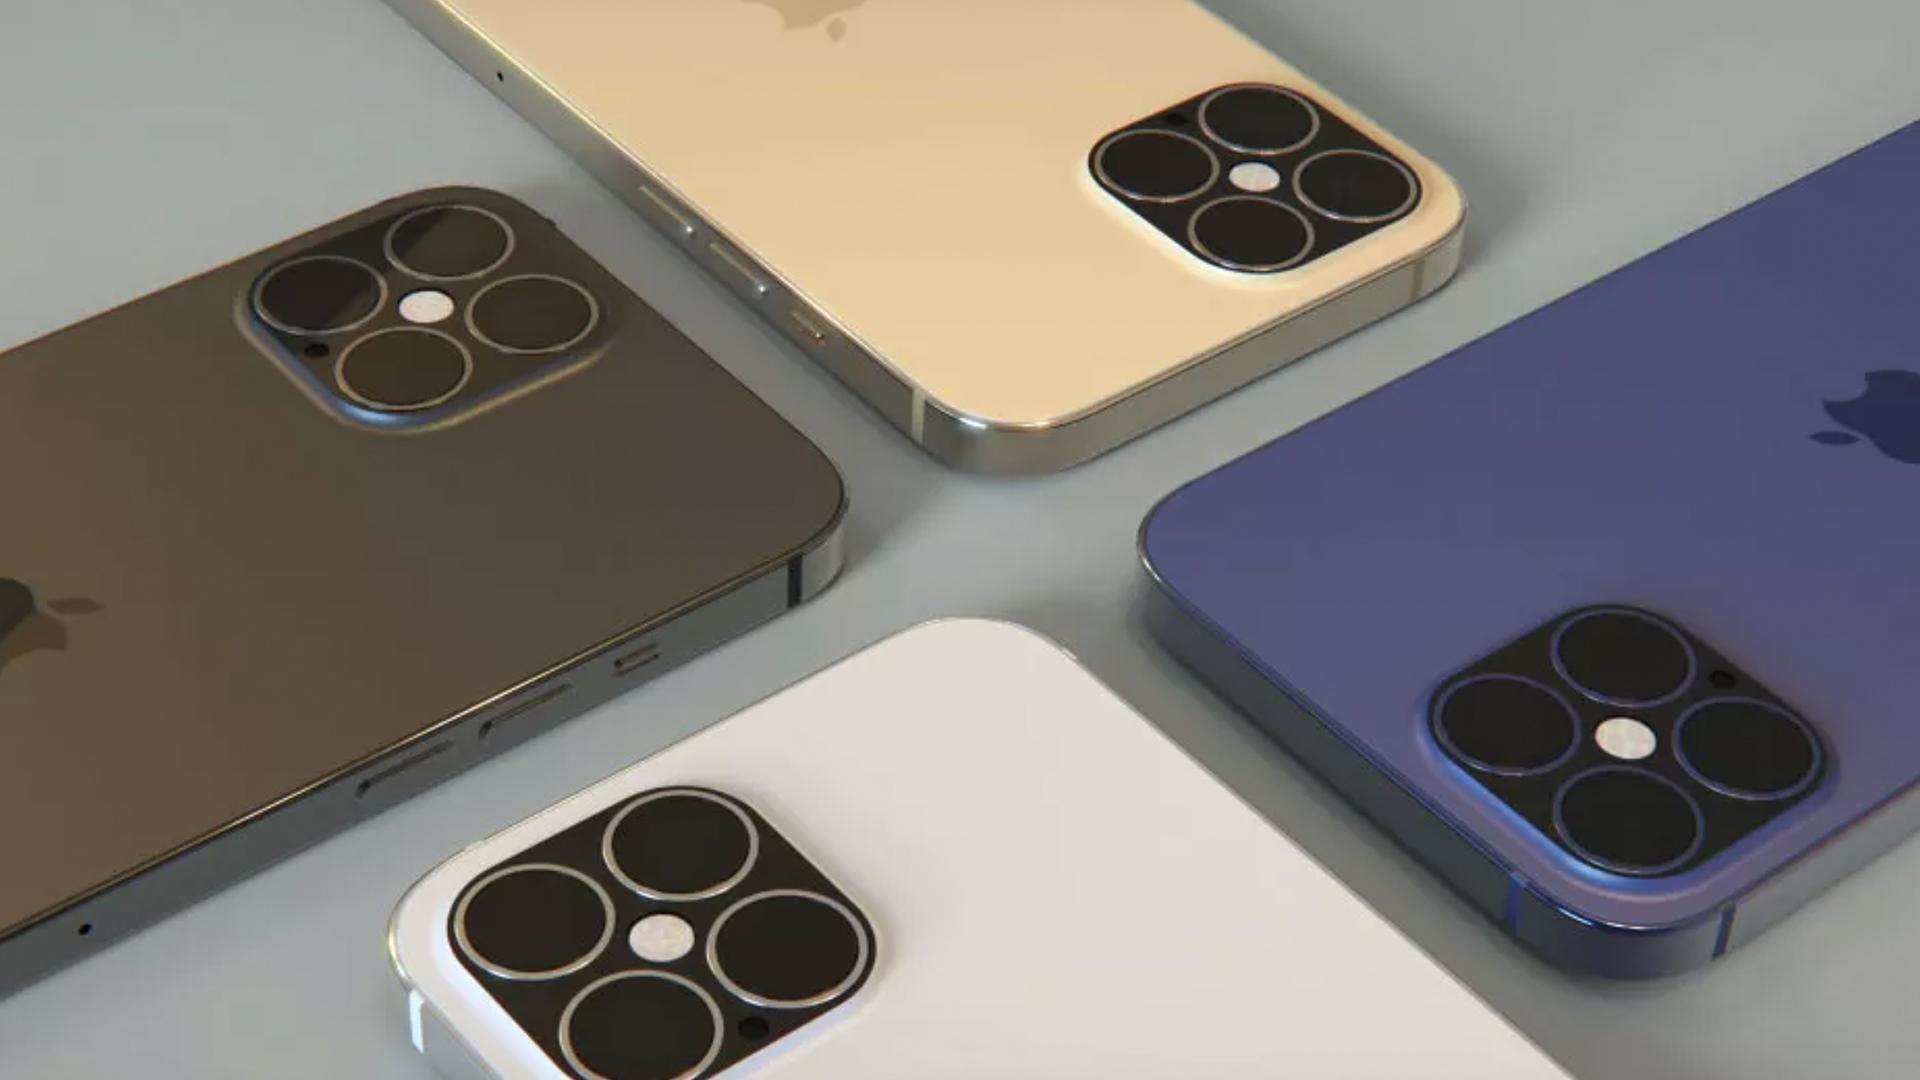 apple wwdc 2021 iphone 13